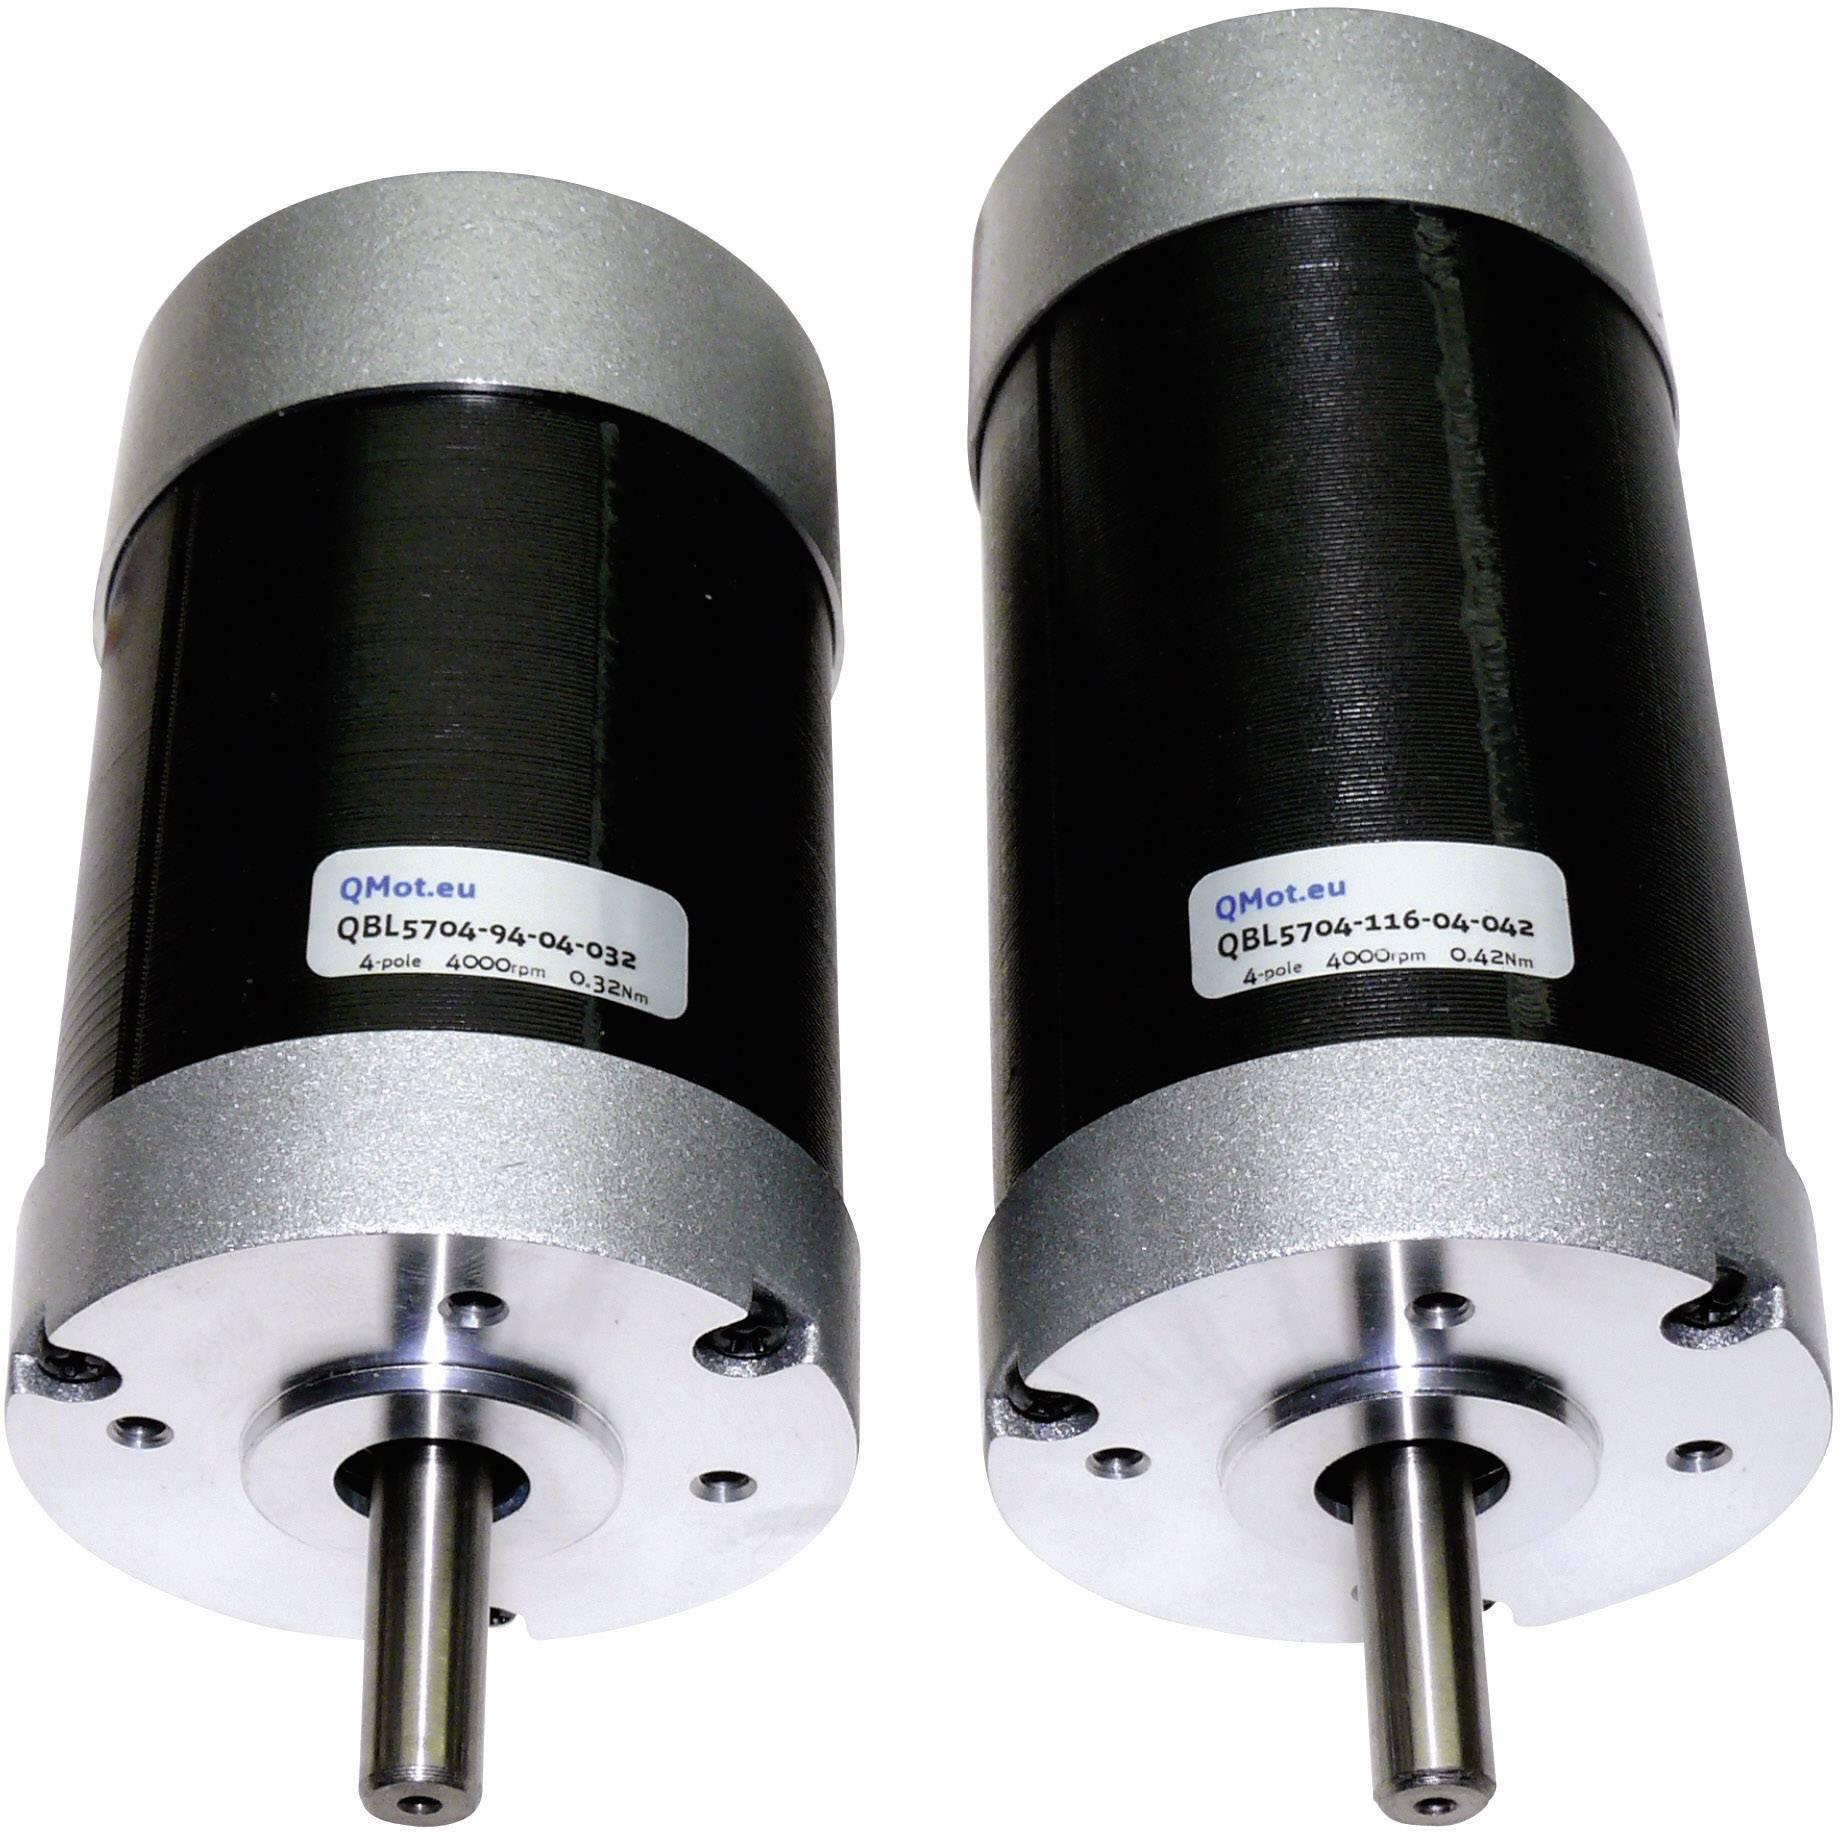 BLDC motor Trinamic QBL5704-116-04-042 (51-0003)